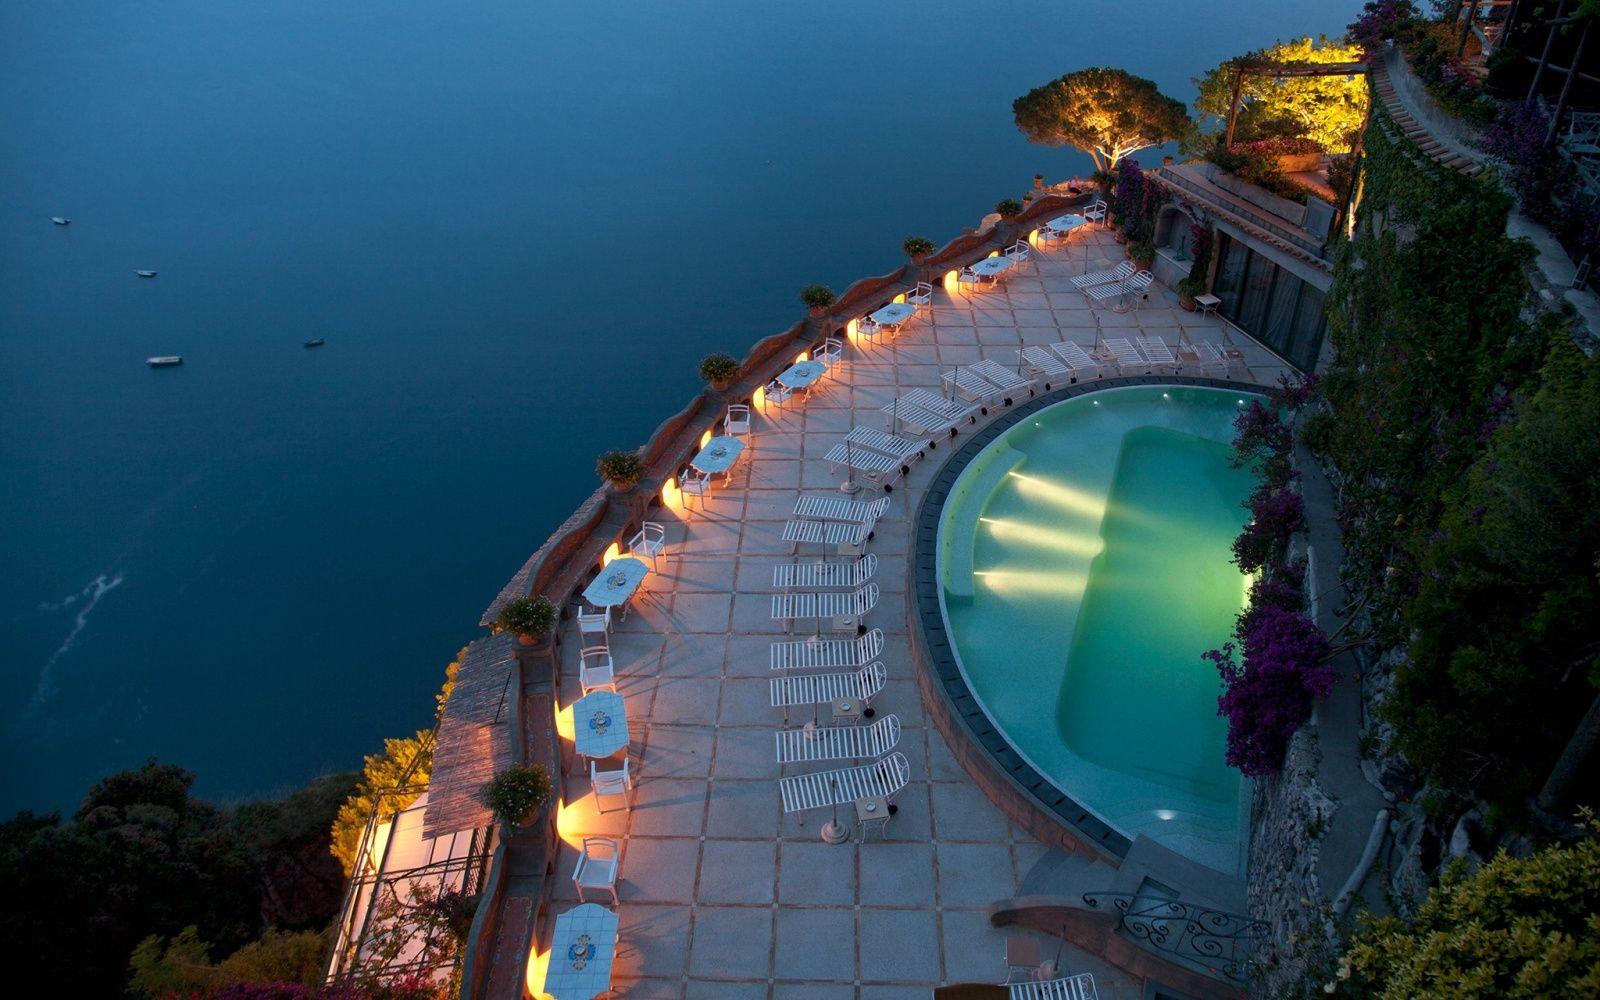 Hotel De Luxe Positano